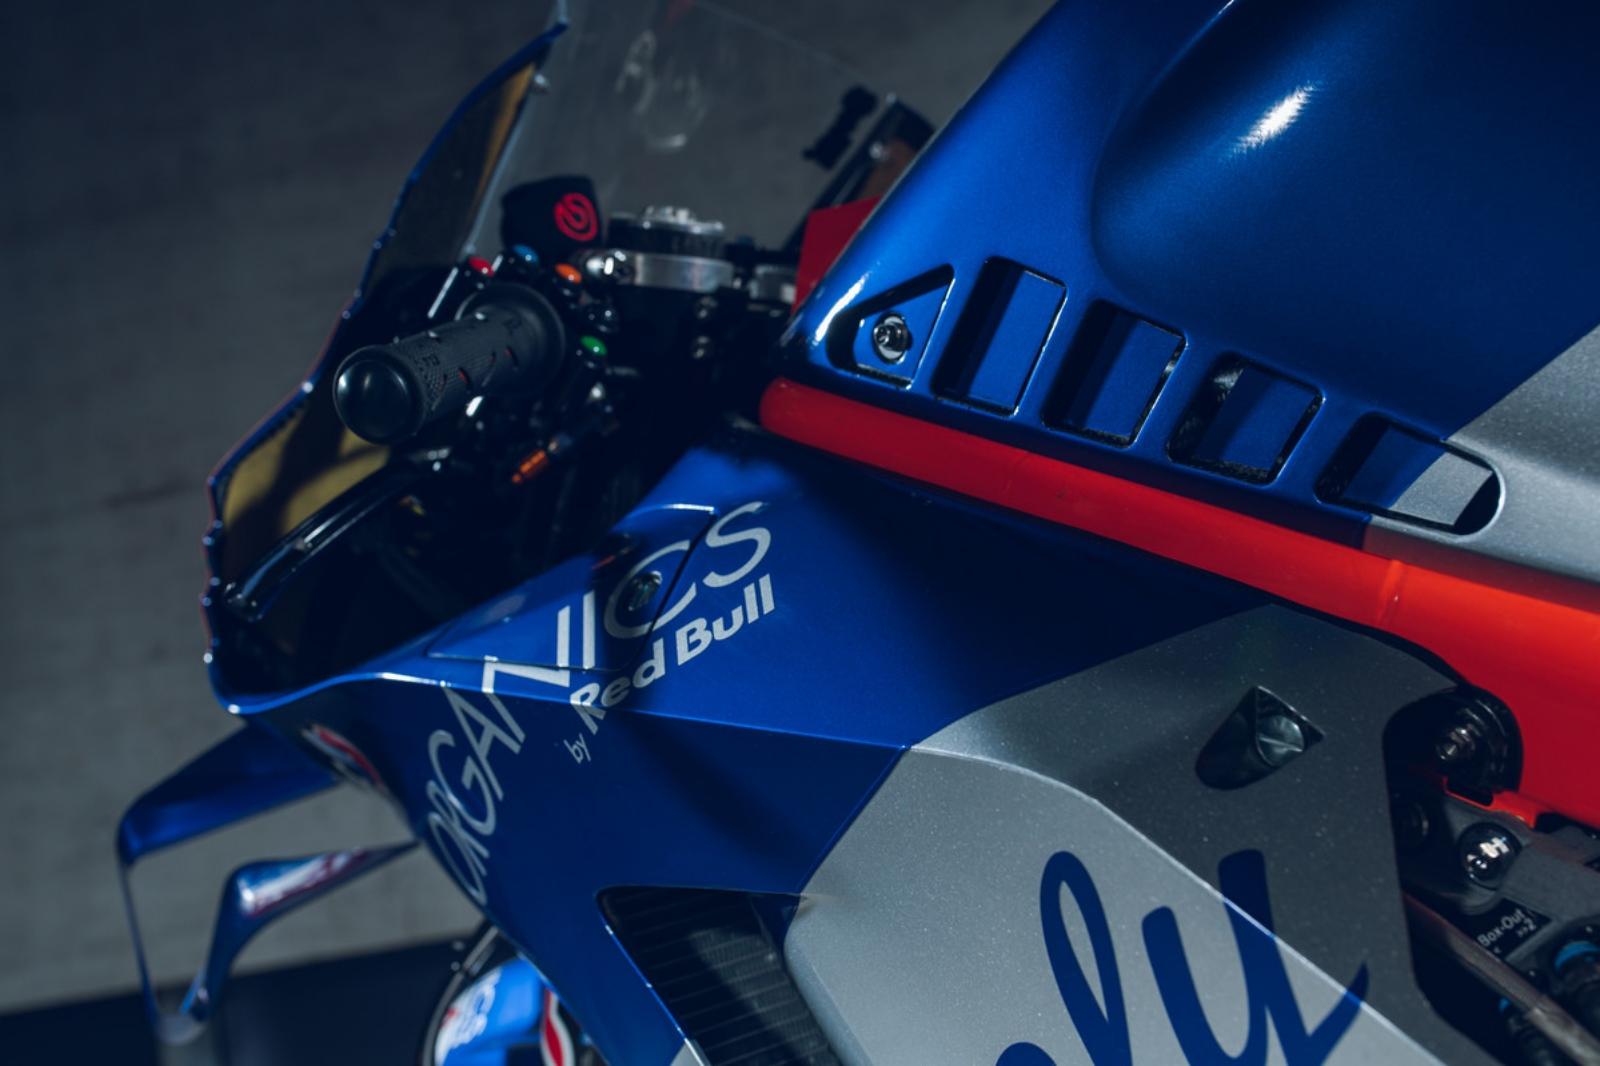 KTM RC16 Tech 3 MotoGP 2020 - Miguel Oliveira & Iker Lecuona